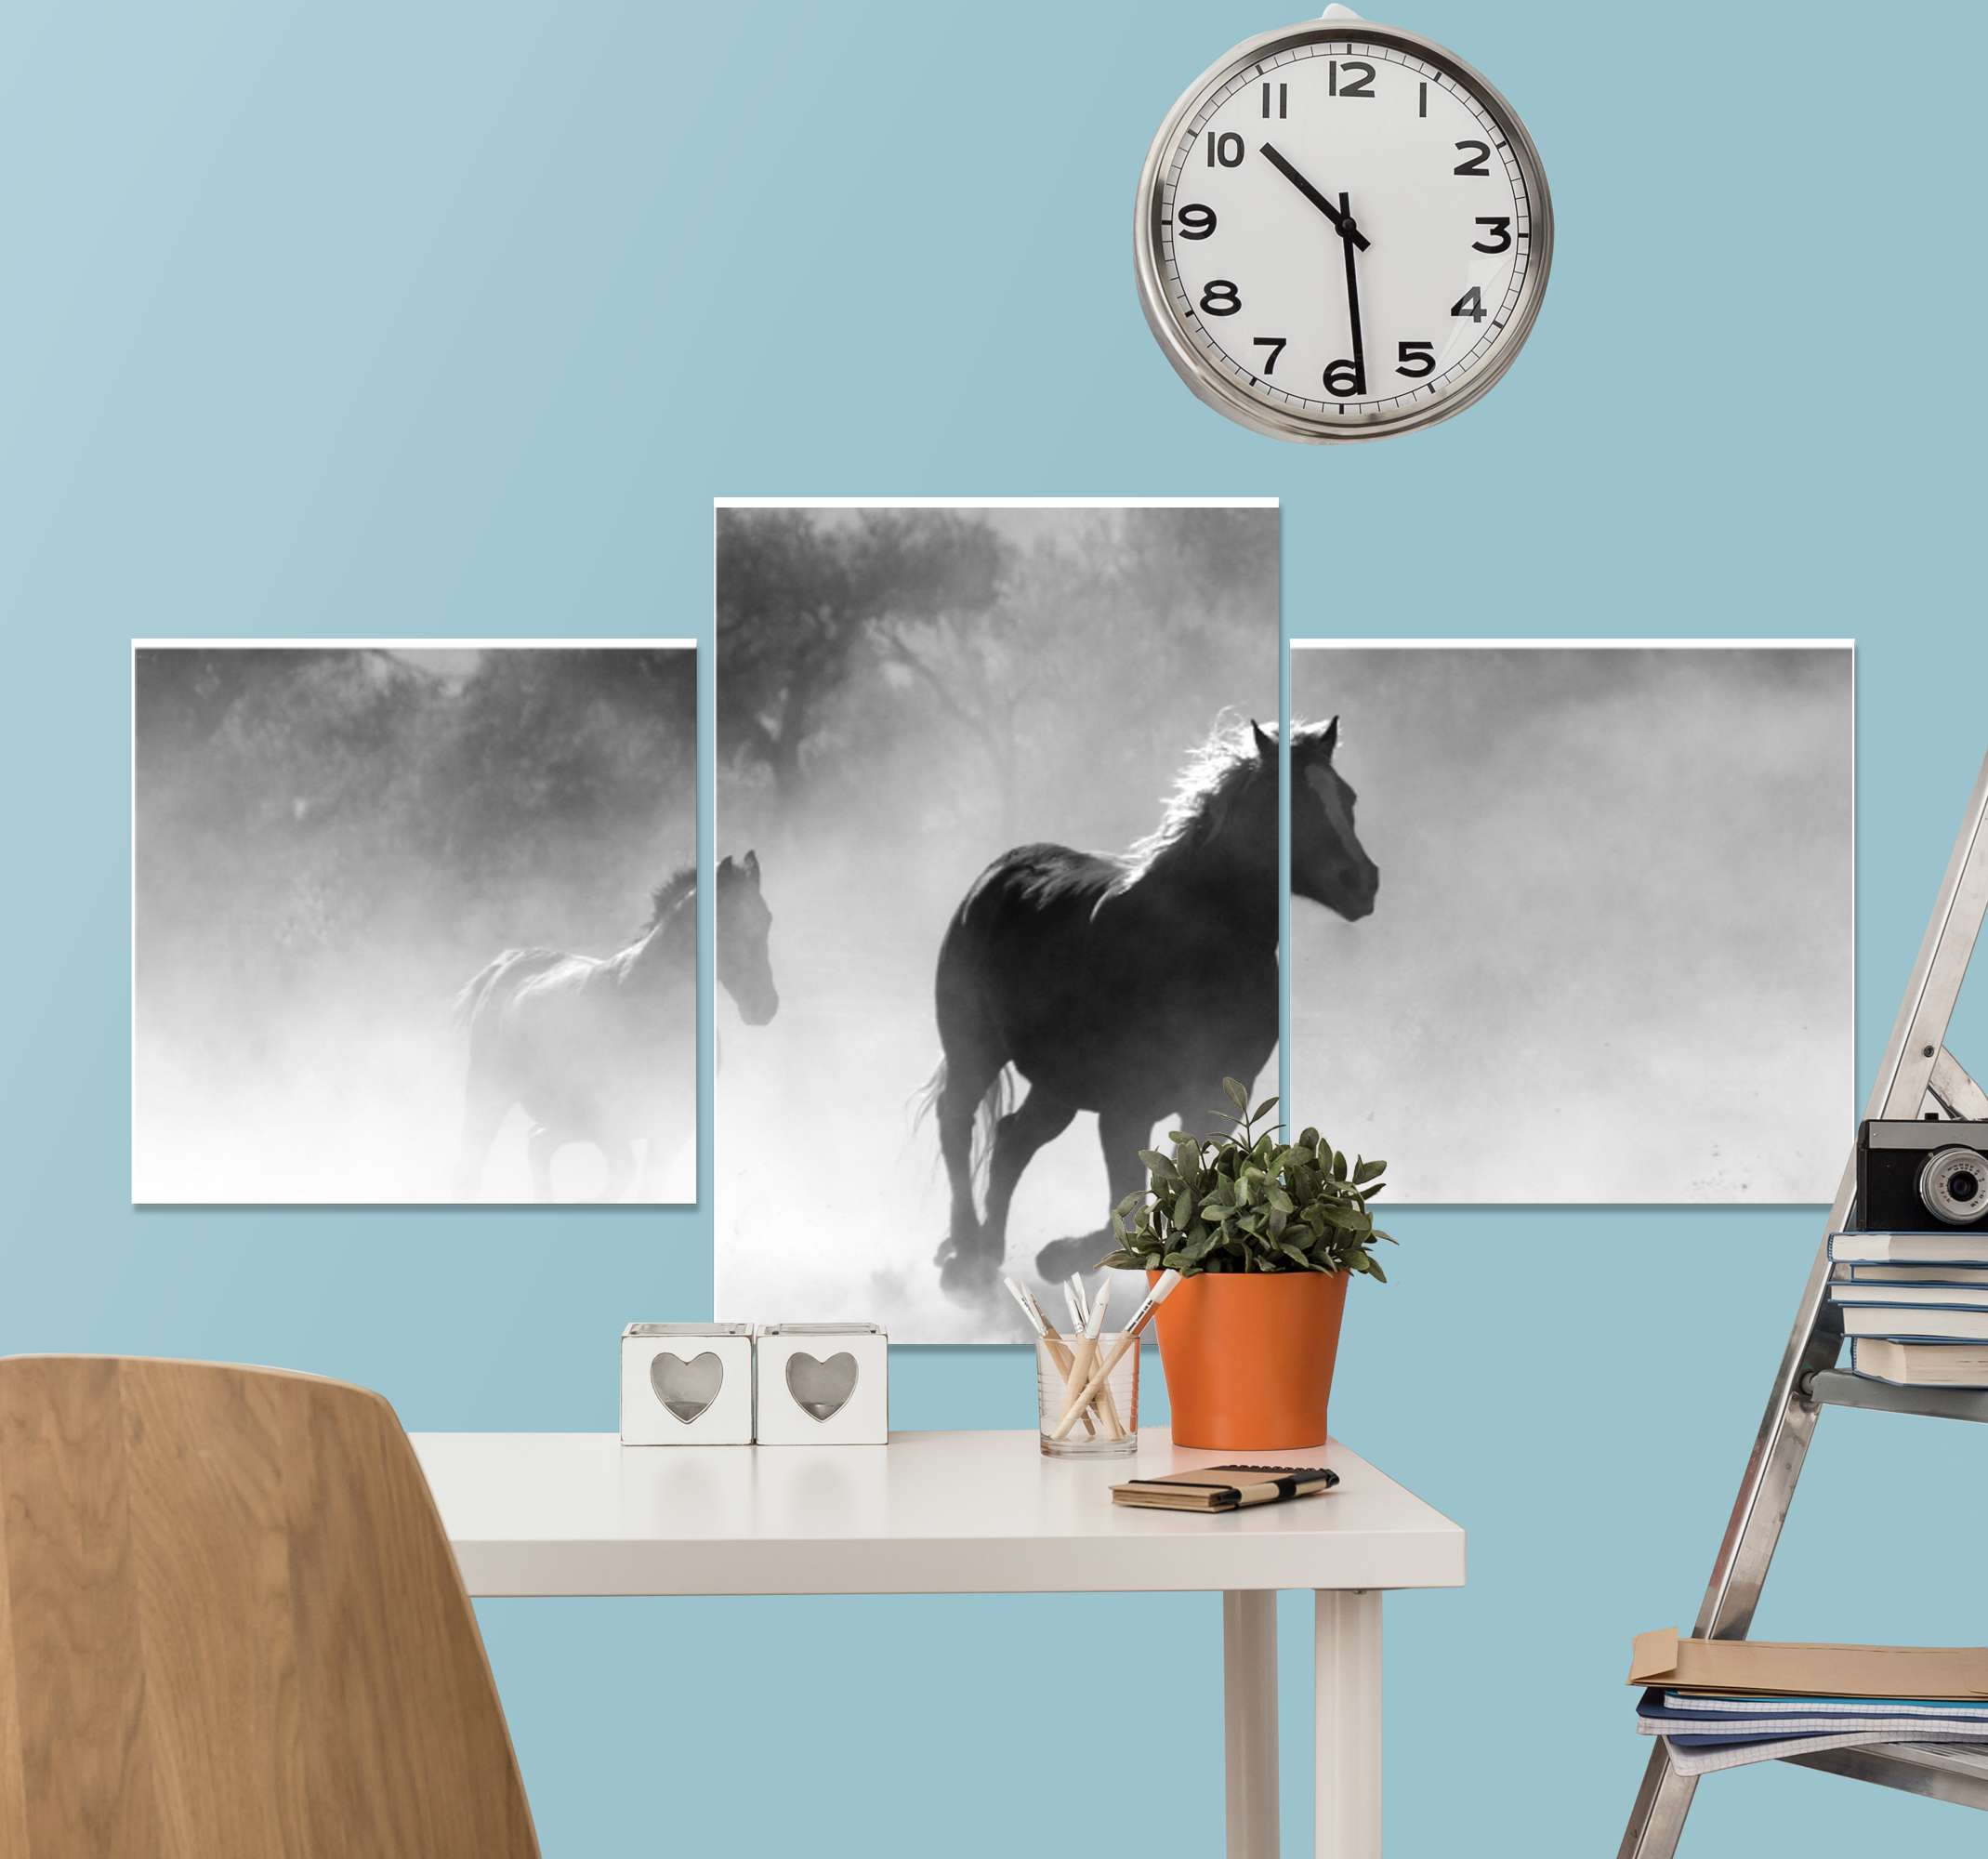 TenStickers. μαύρο και άσπρο τριπλό καμβά αλόγου. καμβάς αλόγων που περιέχει μια εικόνα δύο αλόγων που καλπάζουν μέσα από ένα δάσος. εξαιρετικά μακράς διαρκείας υλικό. υψηλή ποιότητα.